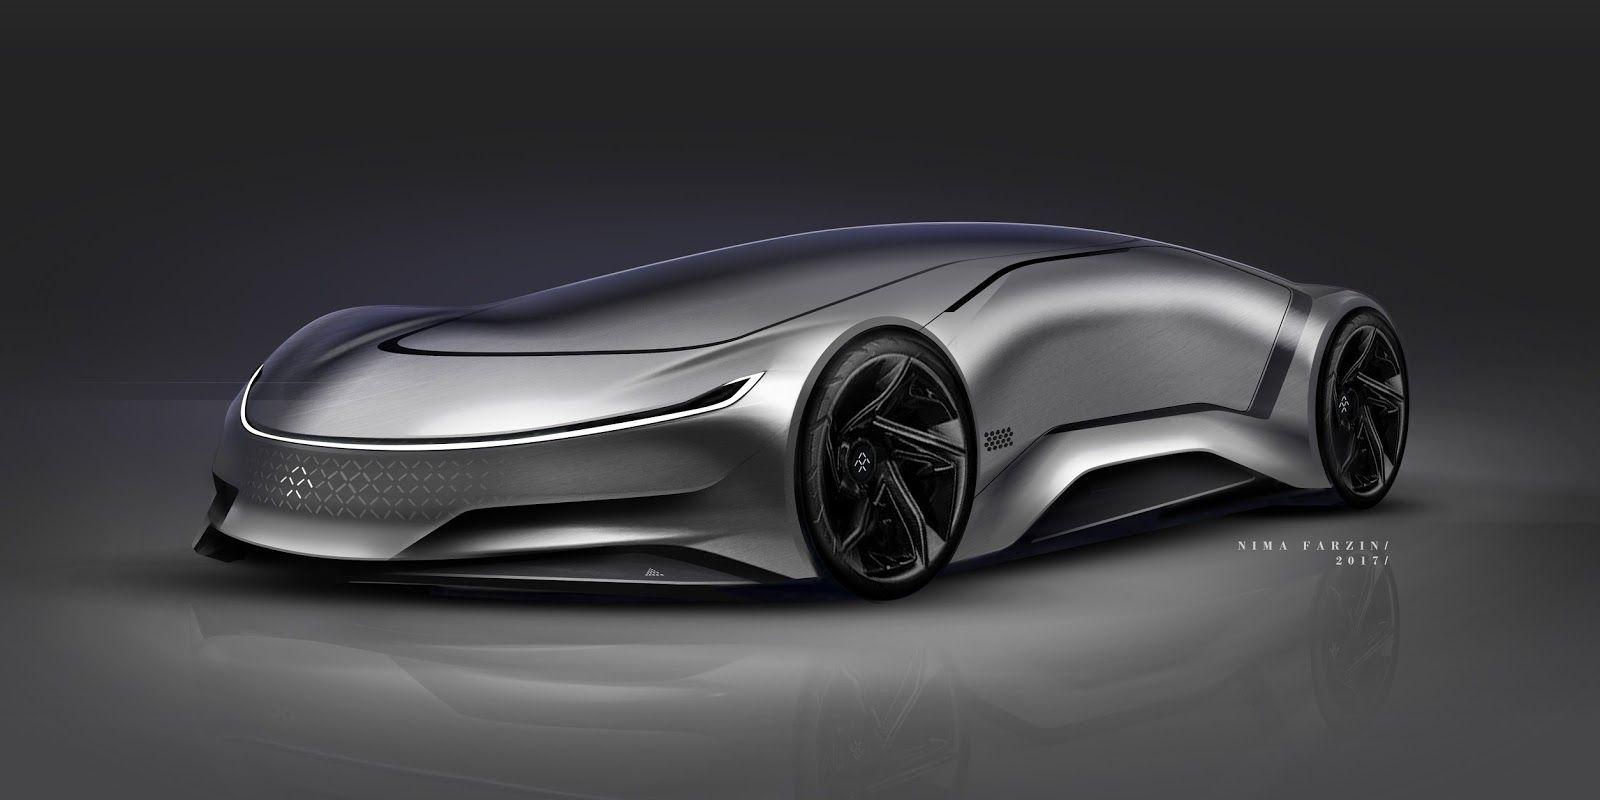 Stunning Sketches From Nima Farzin Motivezine In 2020 Concept Cars Faraday Future New Luxury Cars